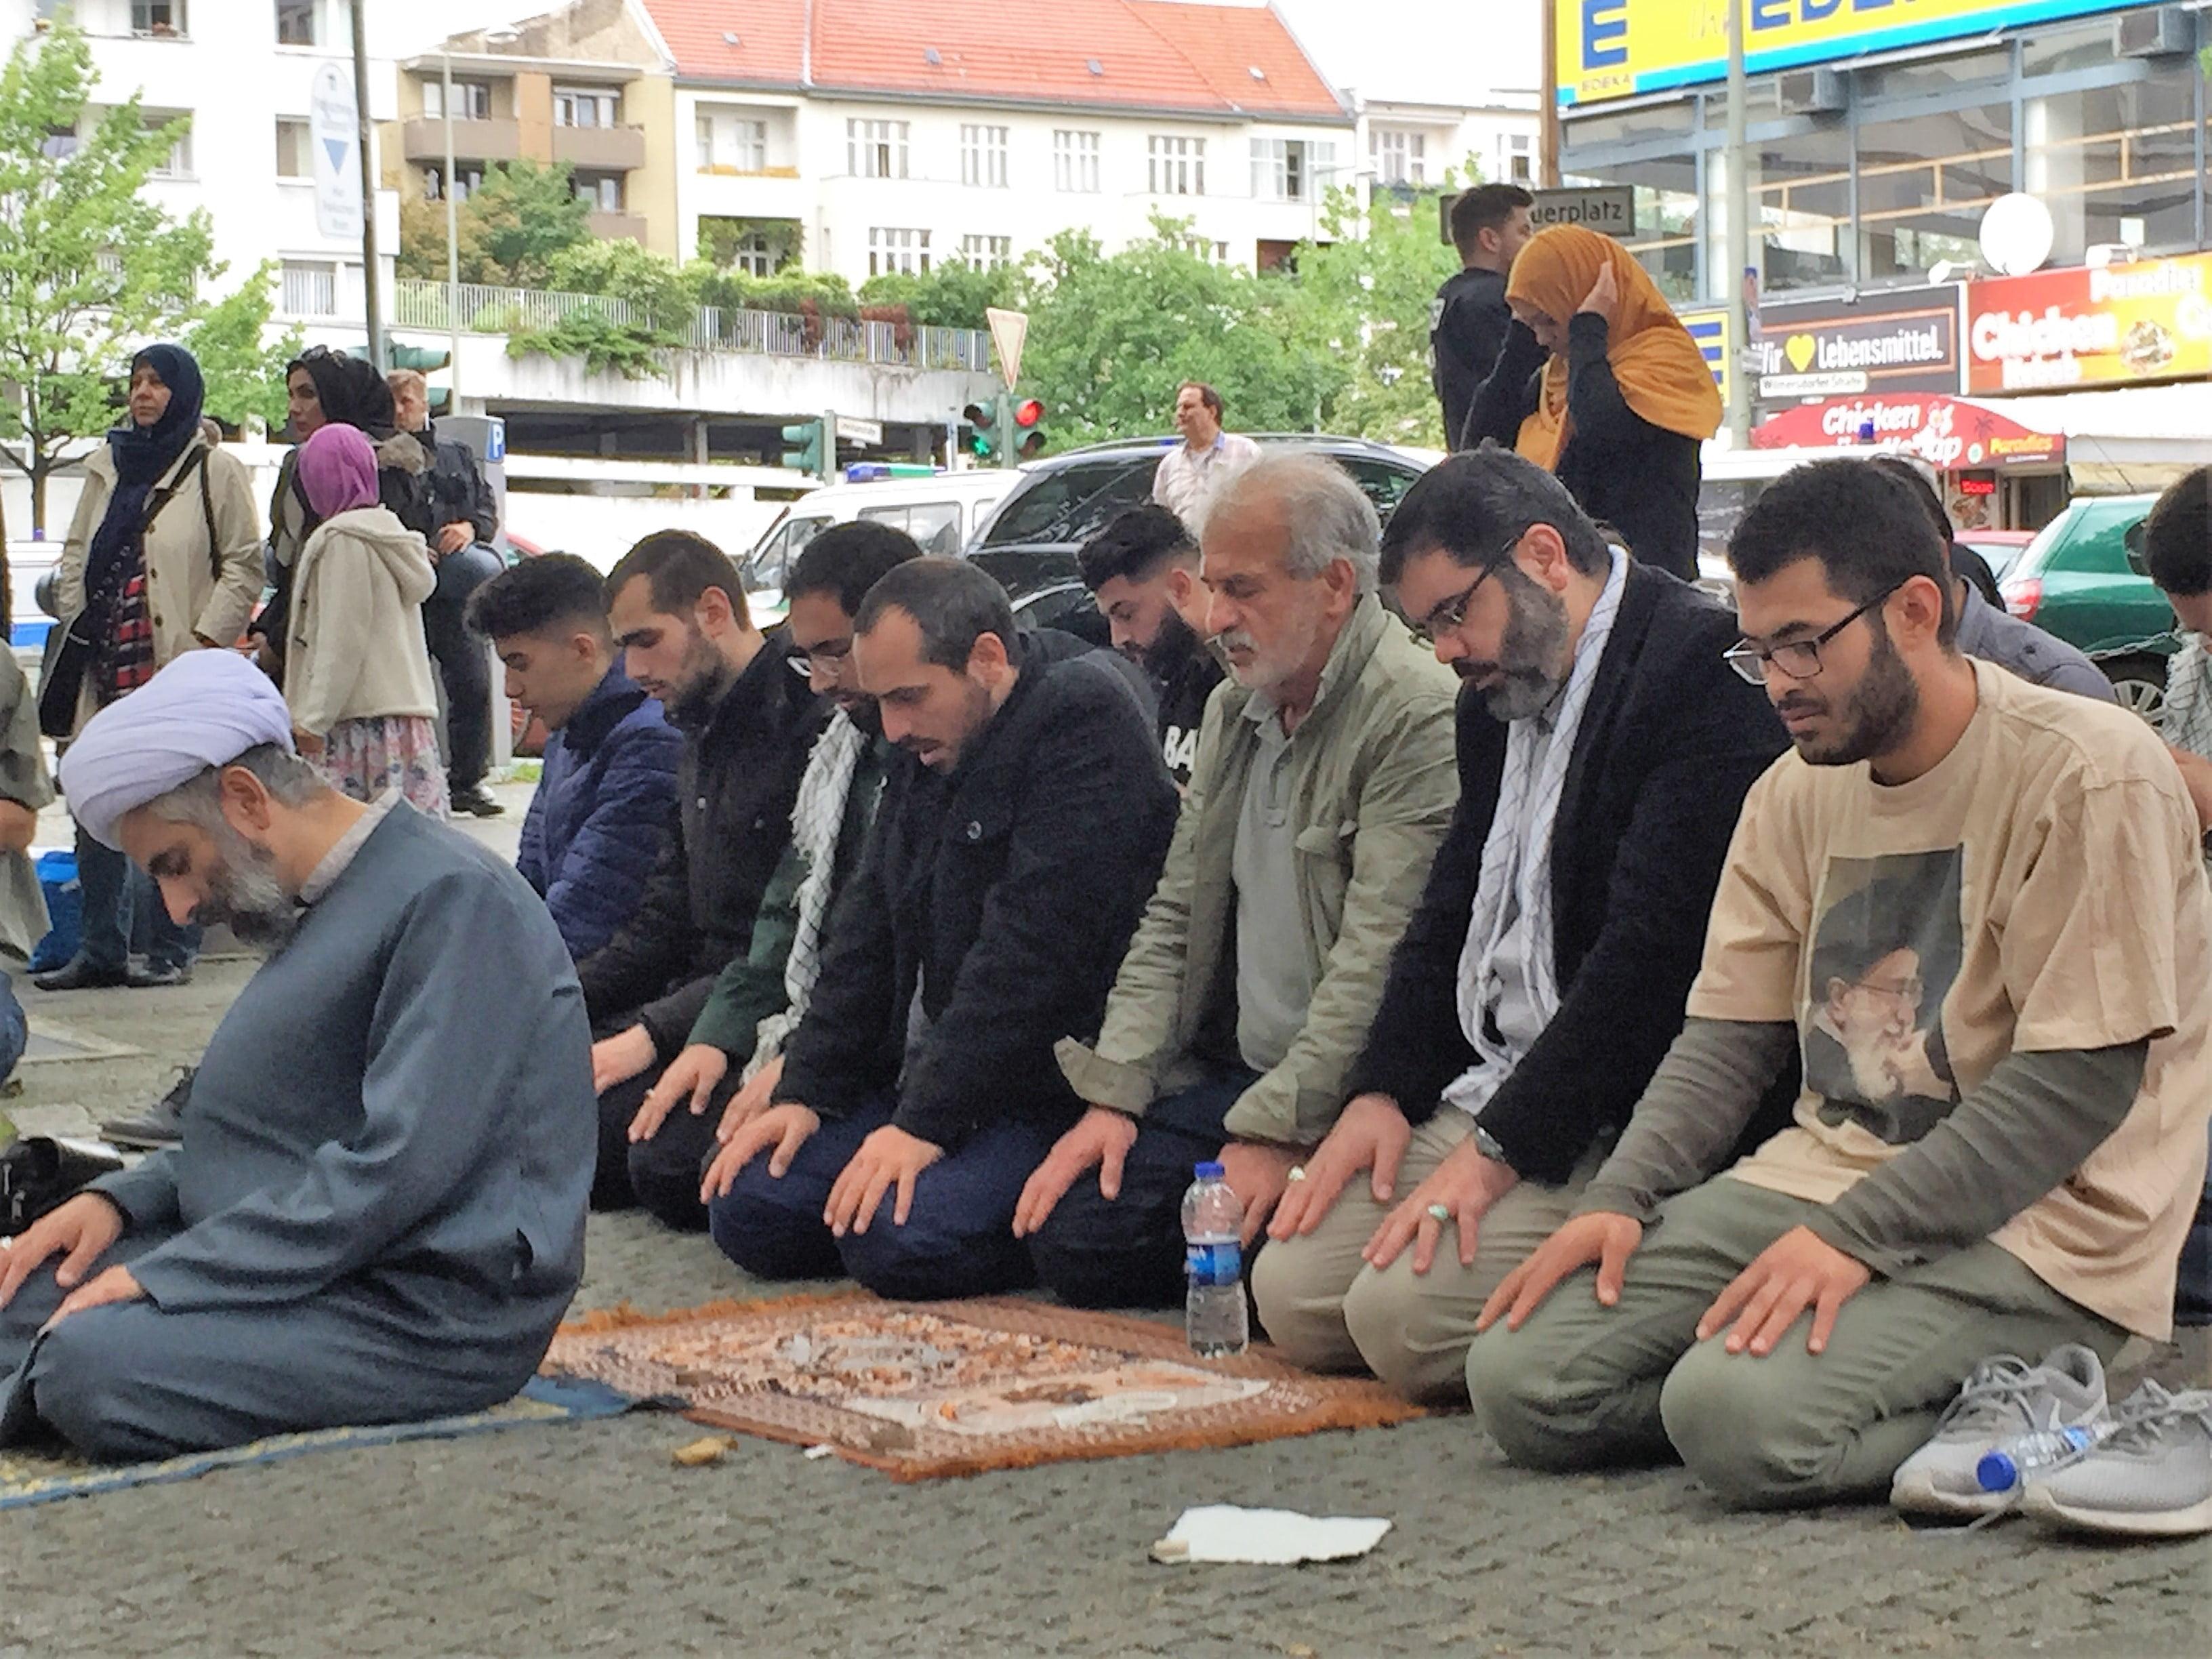 Muslime Islam Berlin